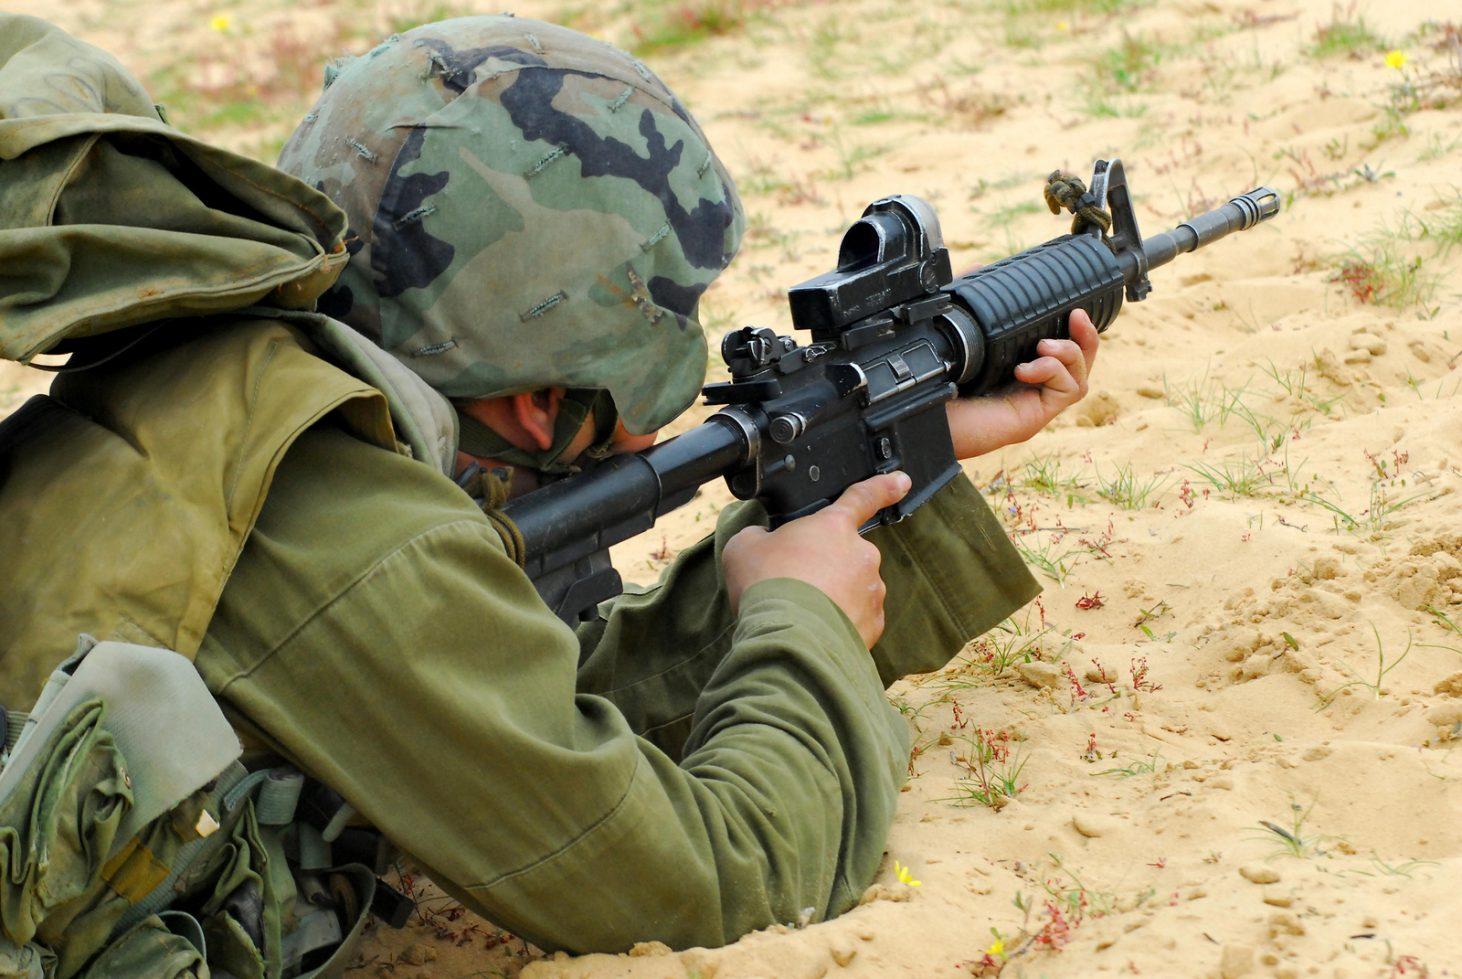 An IDF soldier using the Meprolight M21